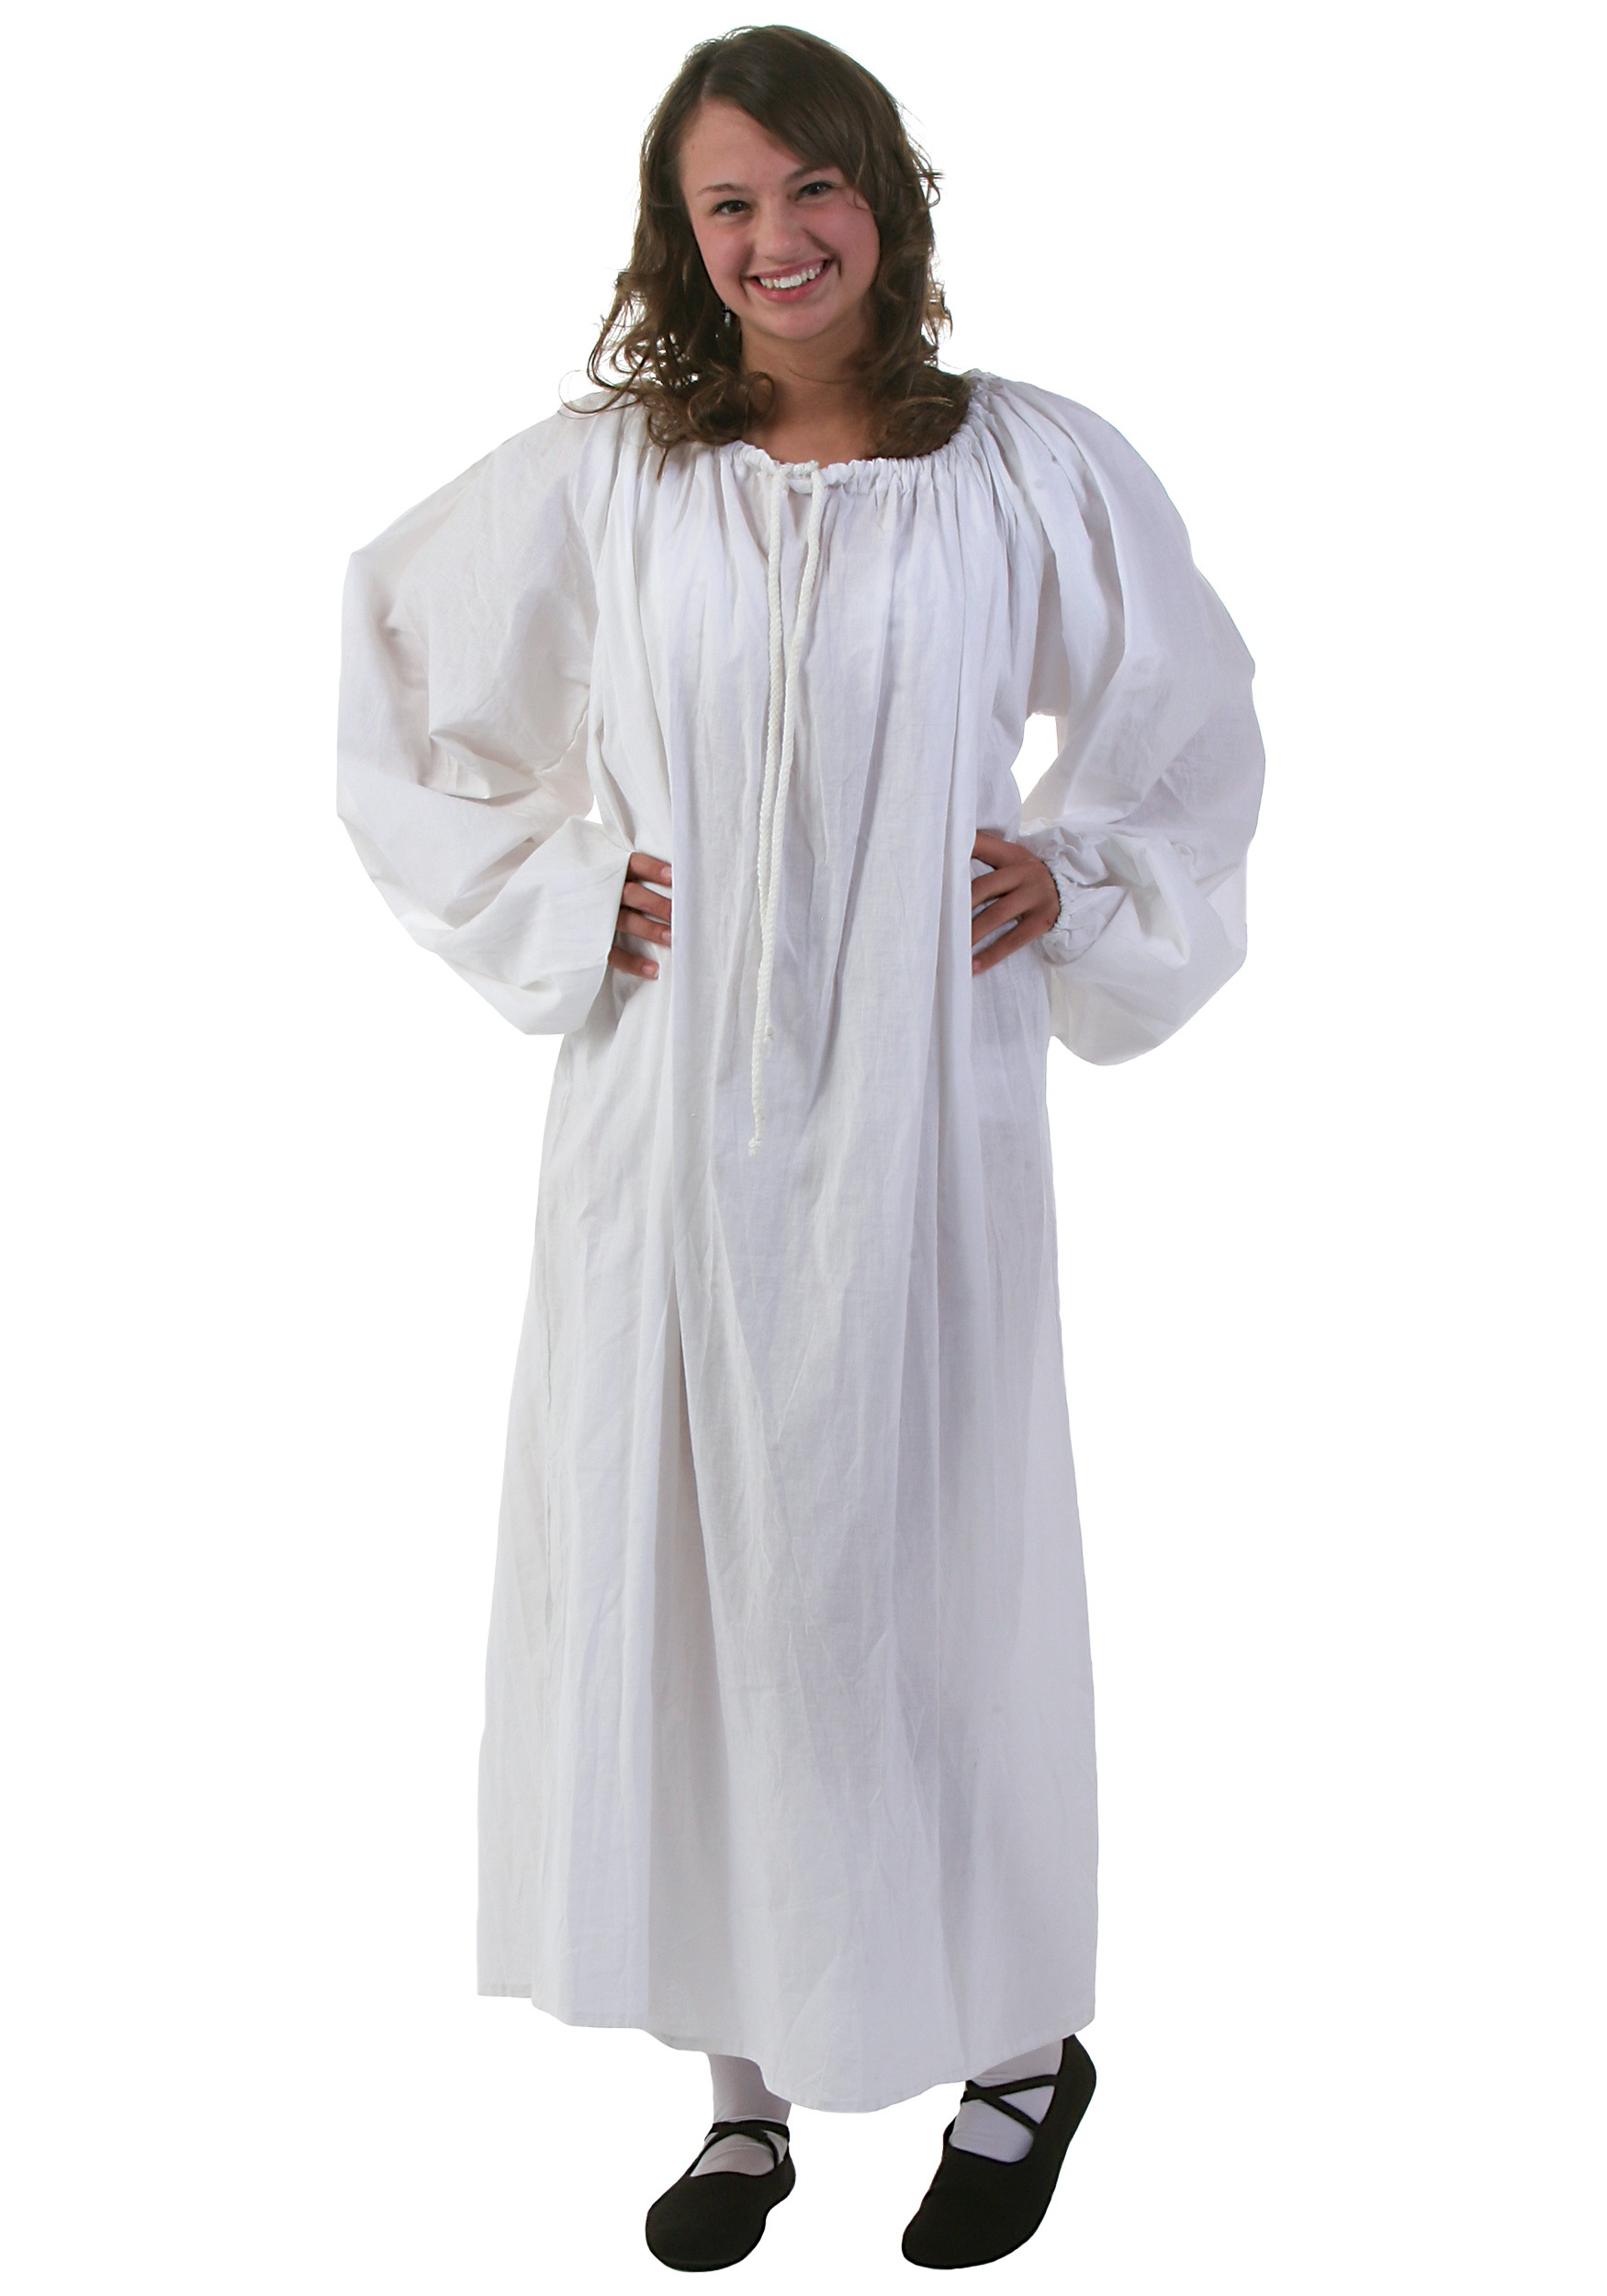 ad19fce2bb0 White Renaissance Chemise - Halloween Costumes